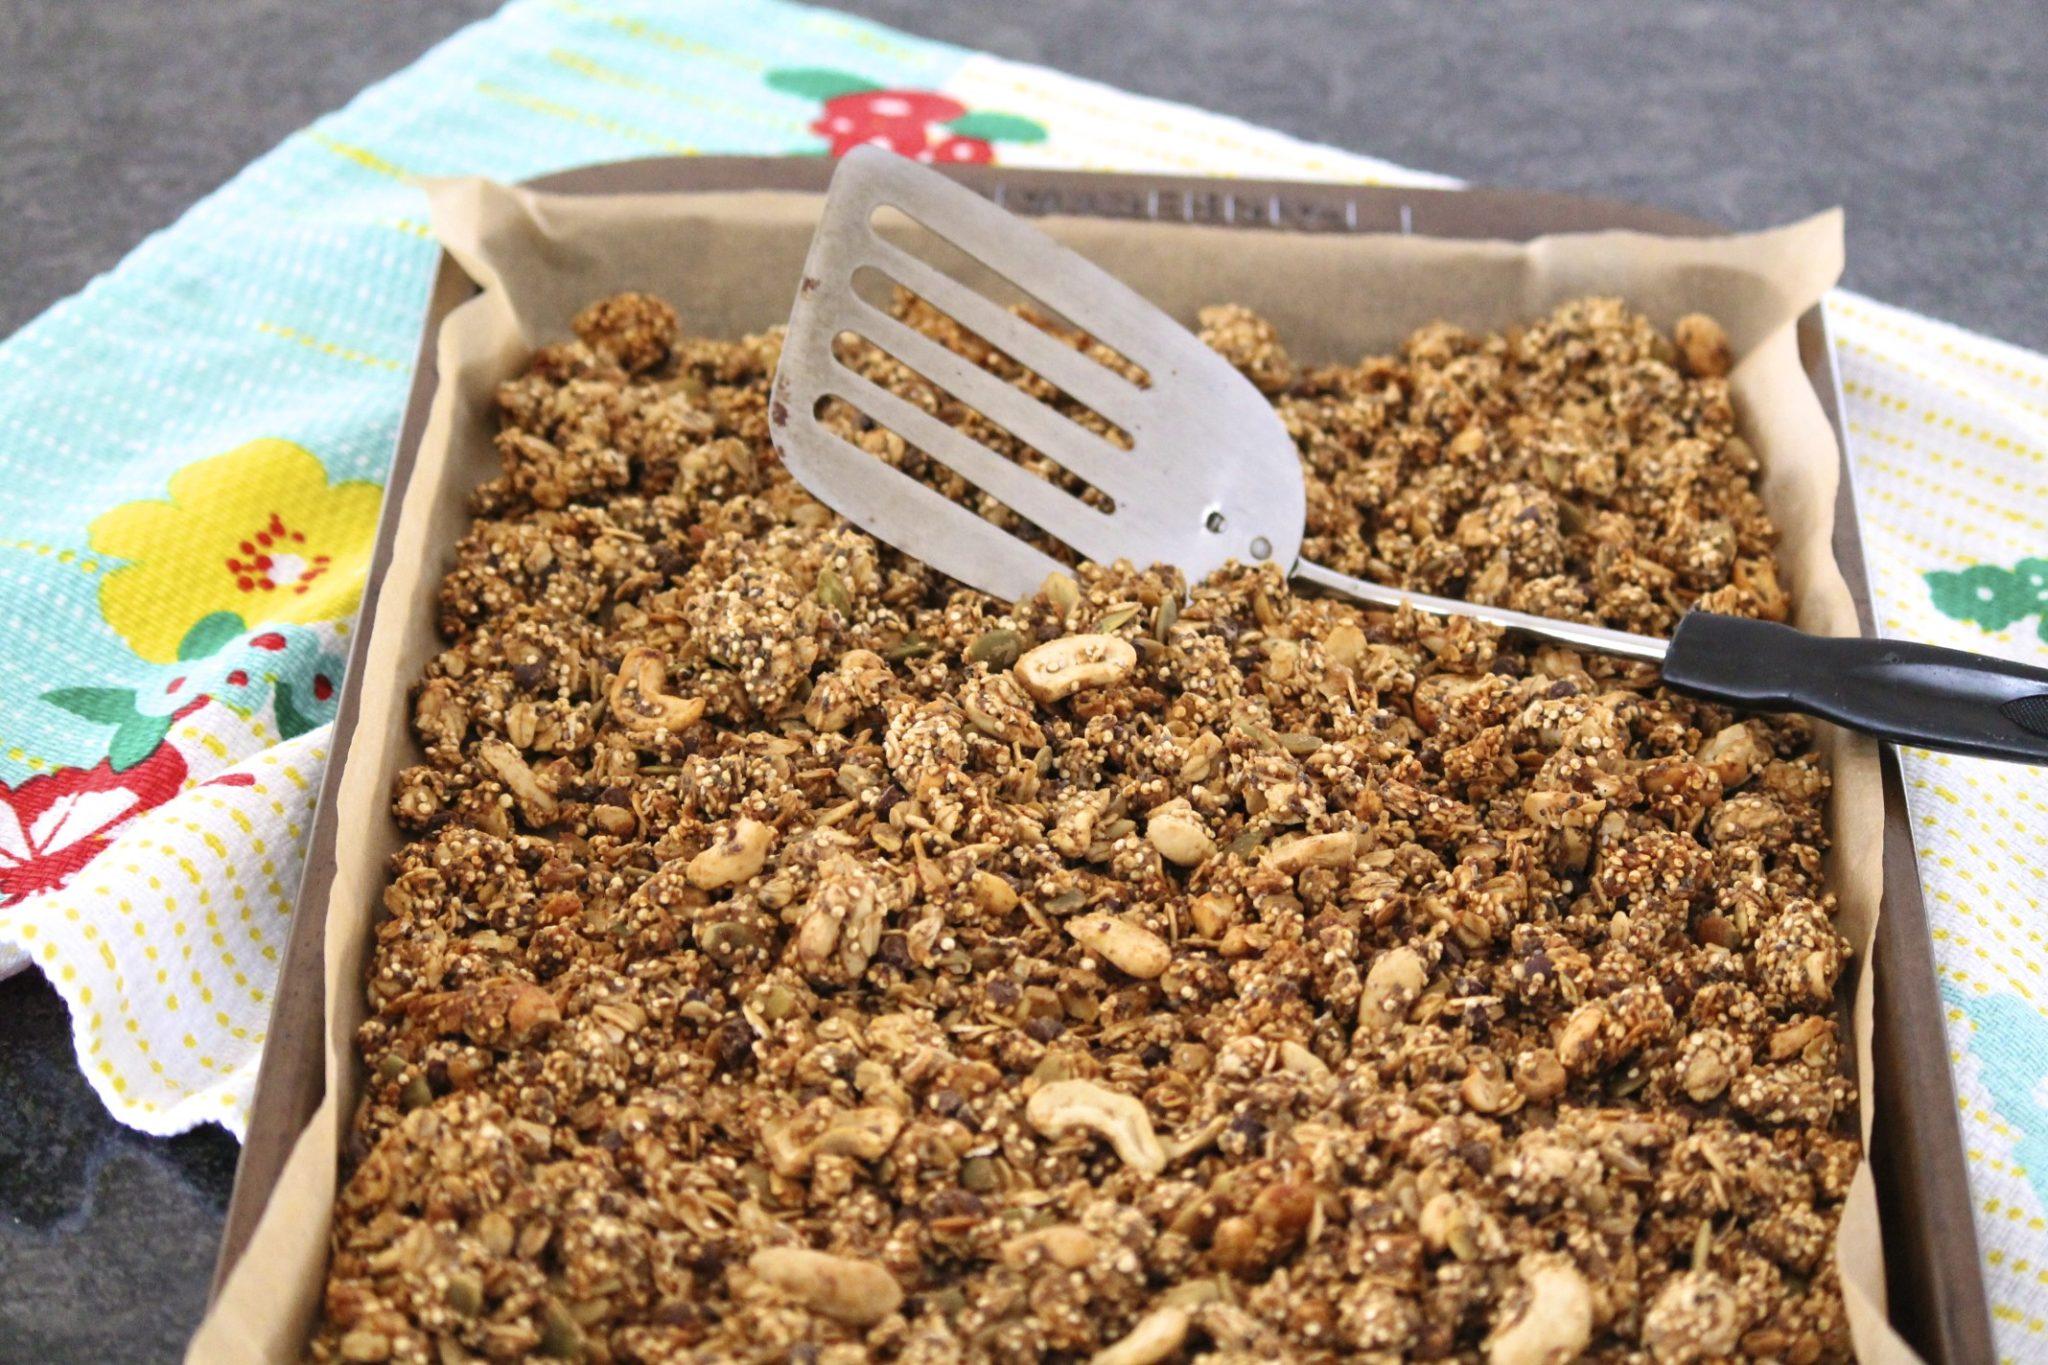 Peanut Butter Chocolate Chip Granola with Quinoa